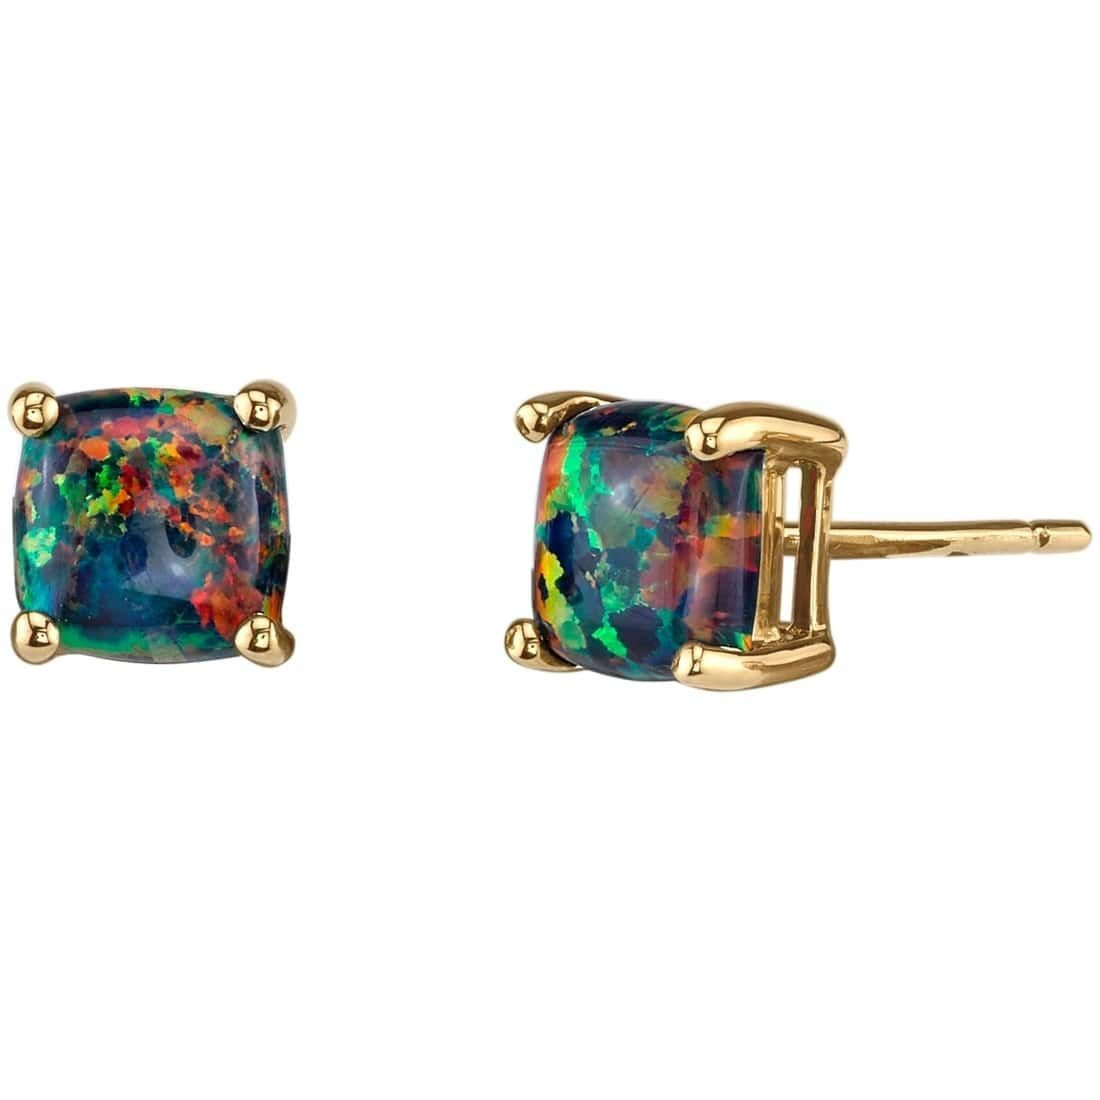 14K Oravo Yellow Gold Cushion Cut Created Opal Stud Earrings, Women's